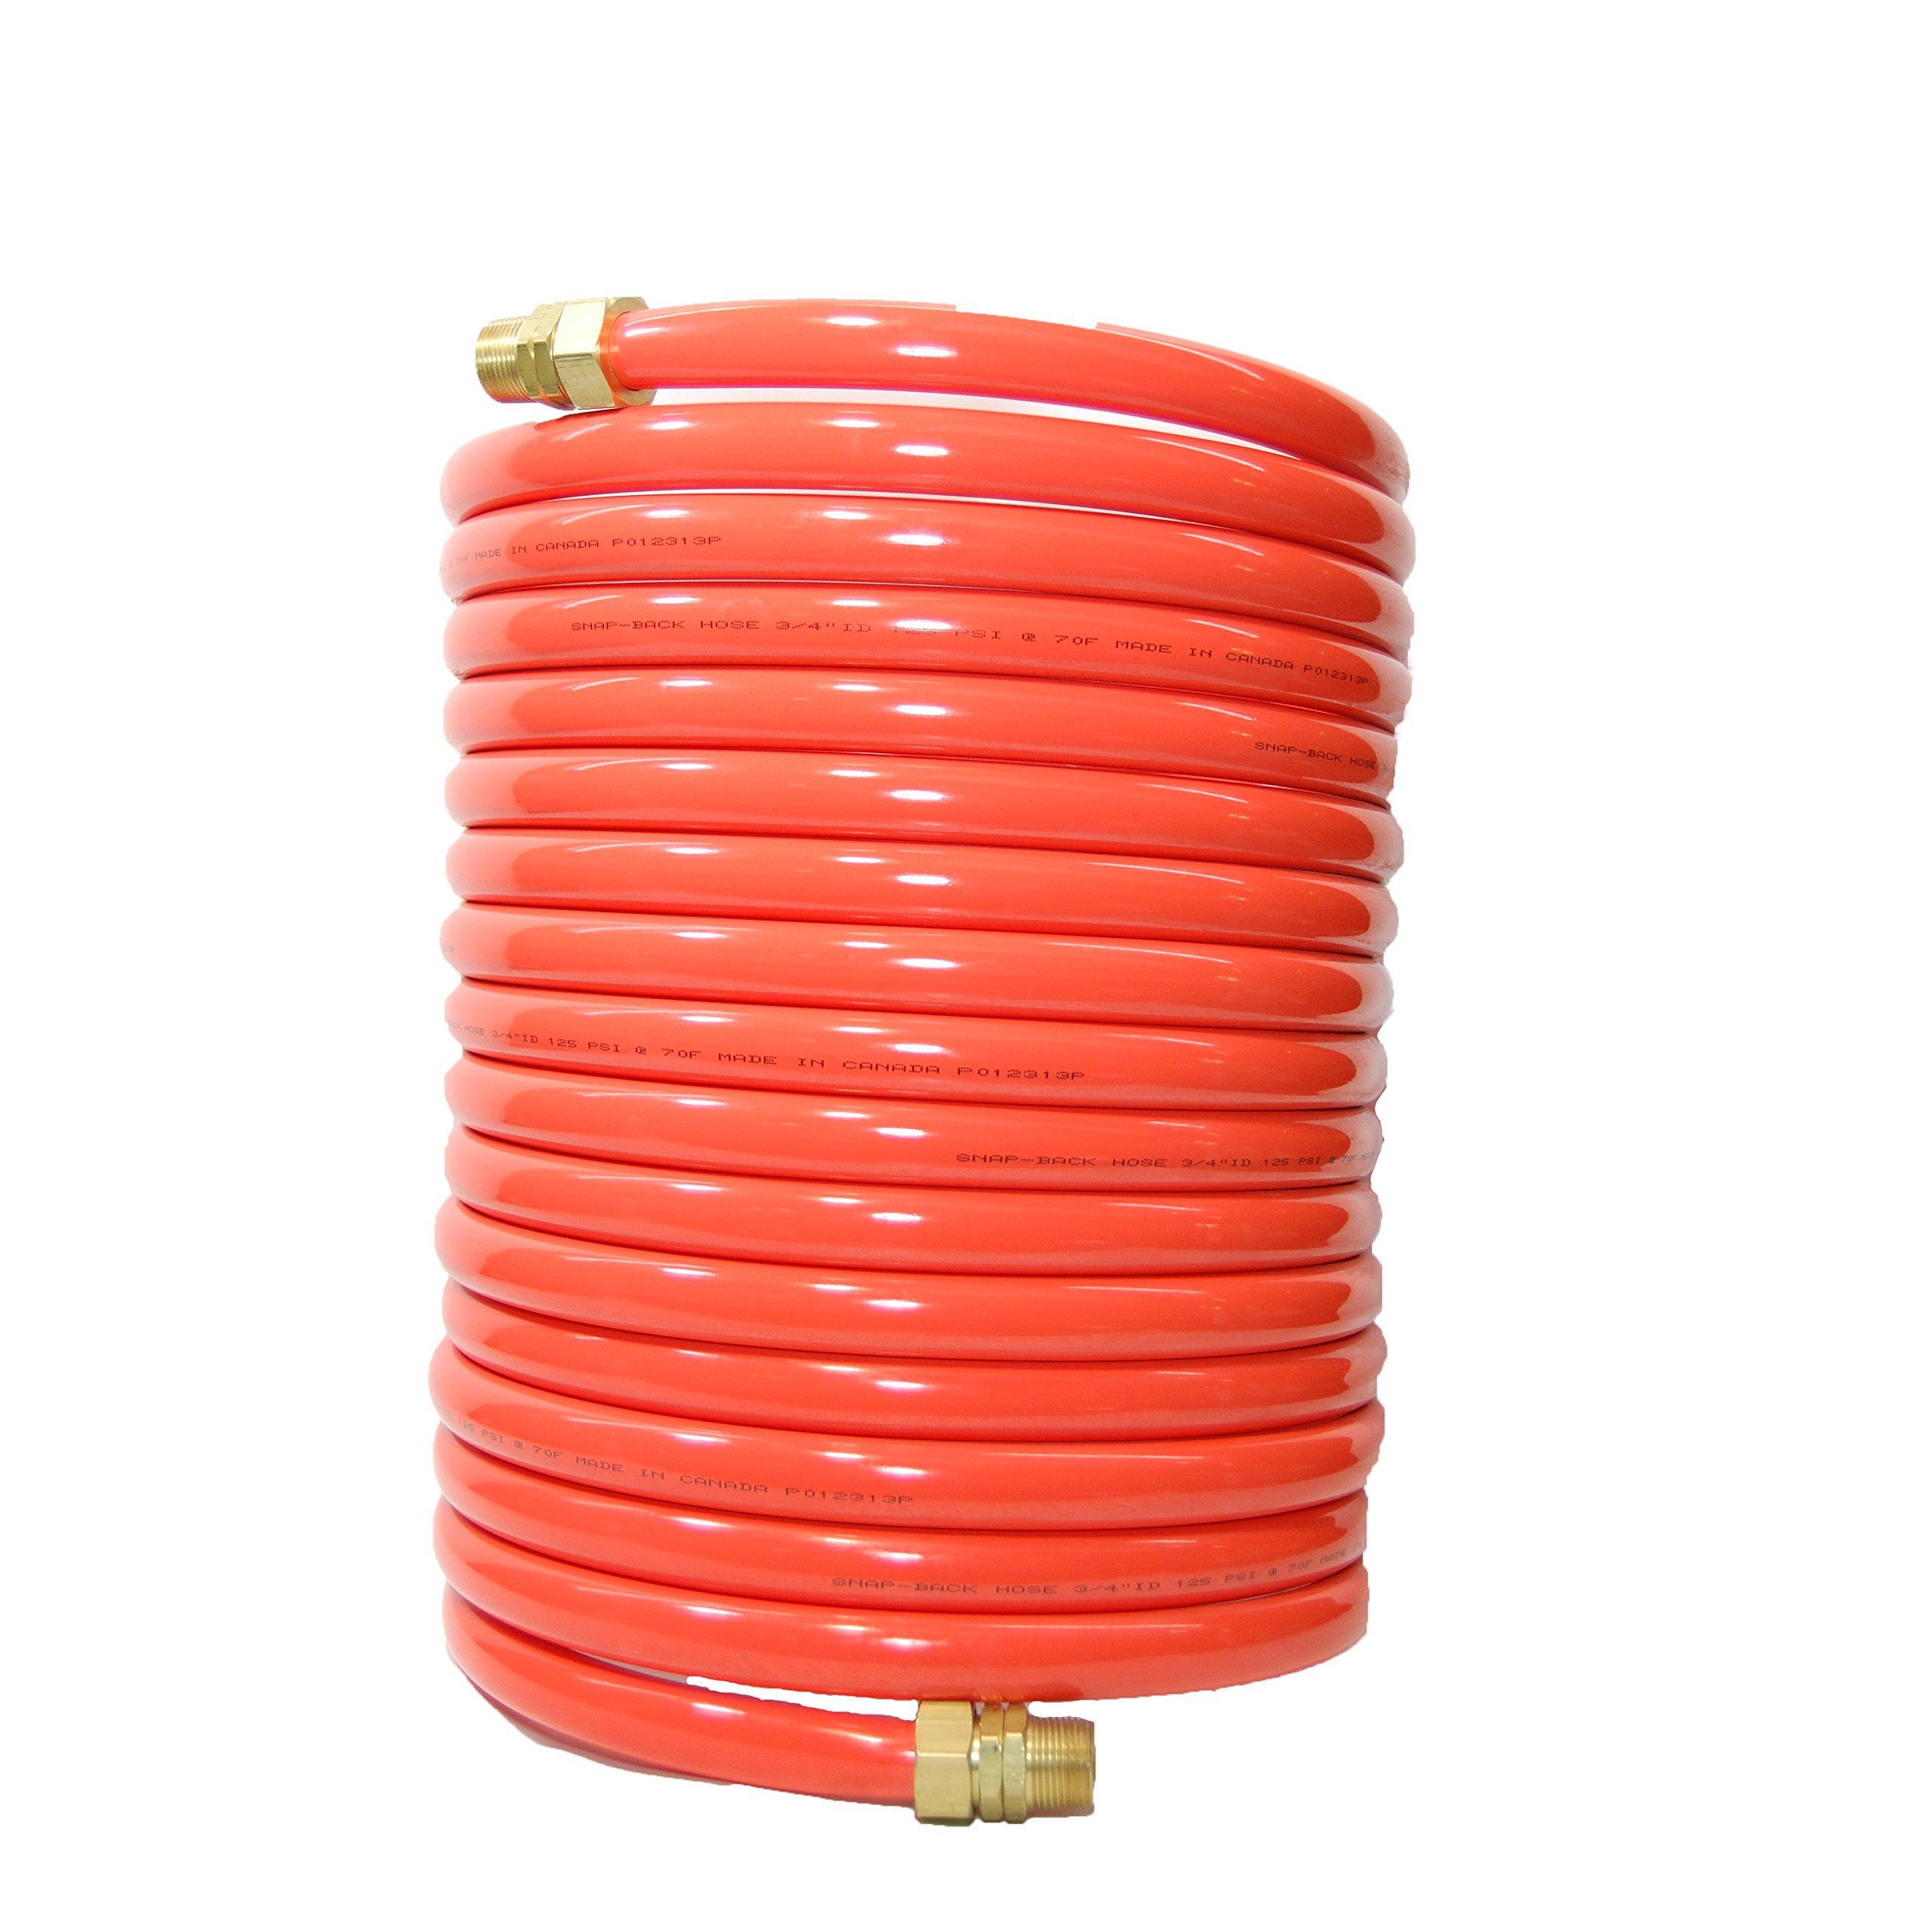 Plastair Industrial SBH950-91-6-U Copolymer Snapback Recoil Air Hose, 50' Length, 0.875'' Coil OD, 185 PSI Maximum Pressure, 0.75'' Coil ID